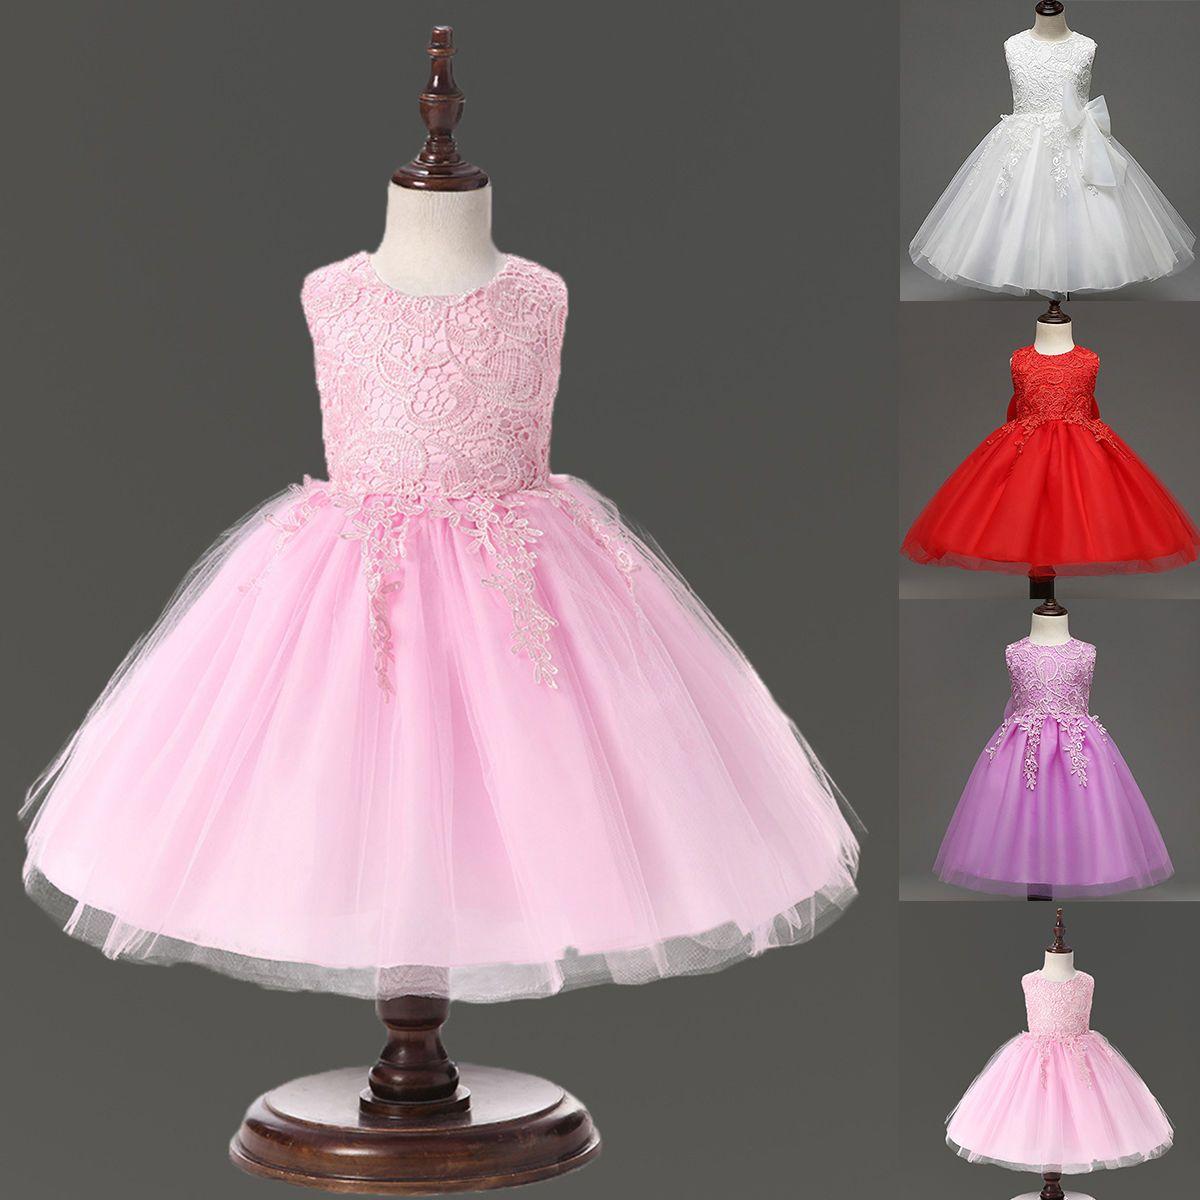 Tutu baby dresses formal girl kid flower bridesmaid party wedding princess dress